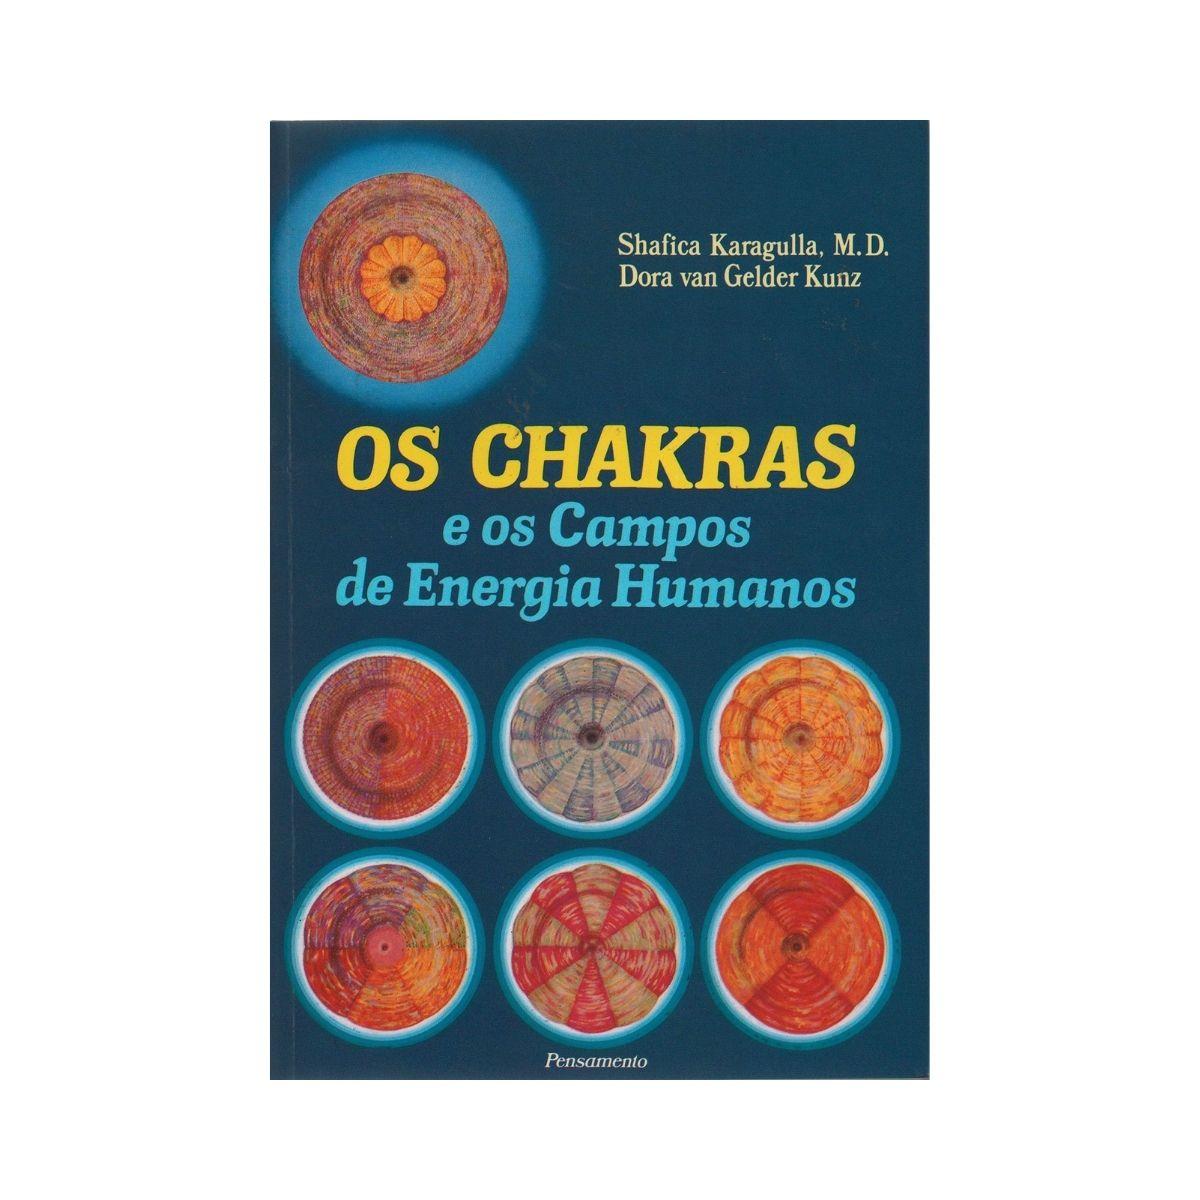 Chakras e Os Campos de Energia Humanos - KARAGULLA, M.D. SHAFICA; KUNZ, DORA VAN GELDER